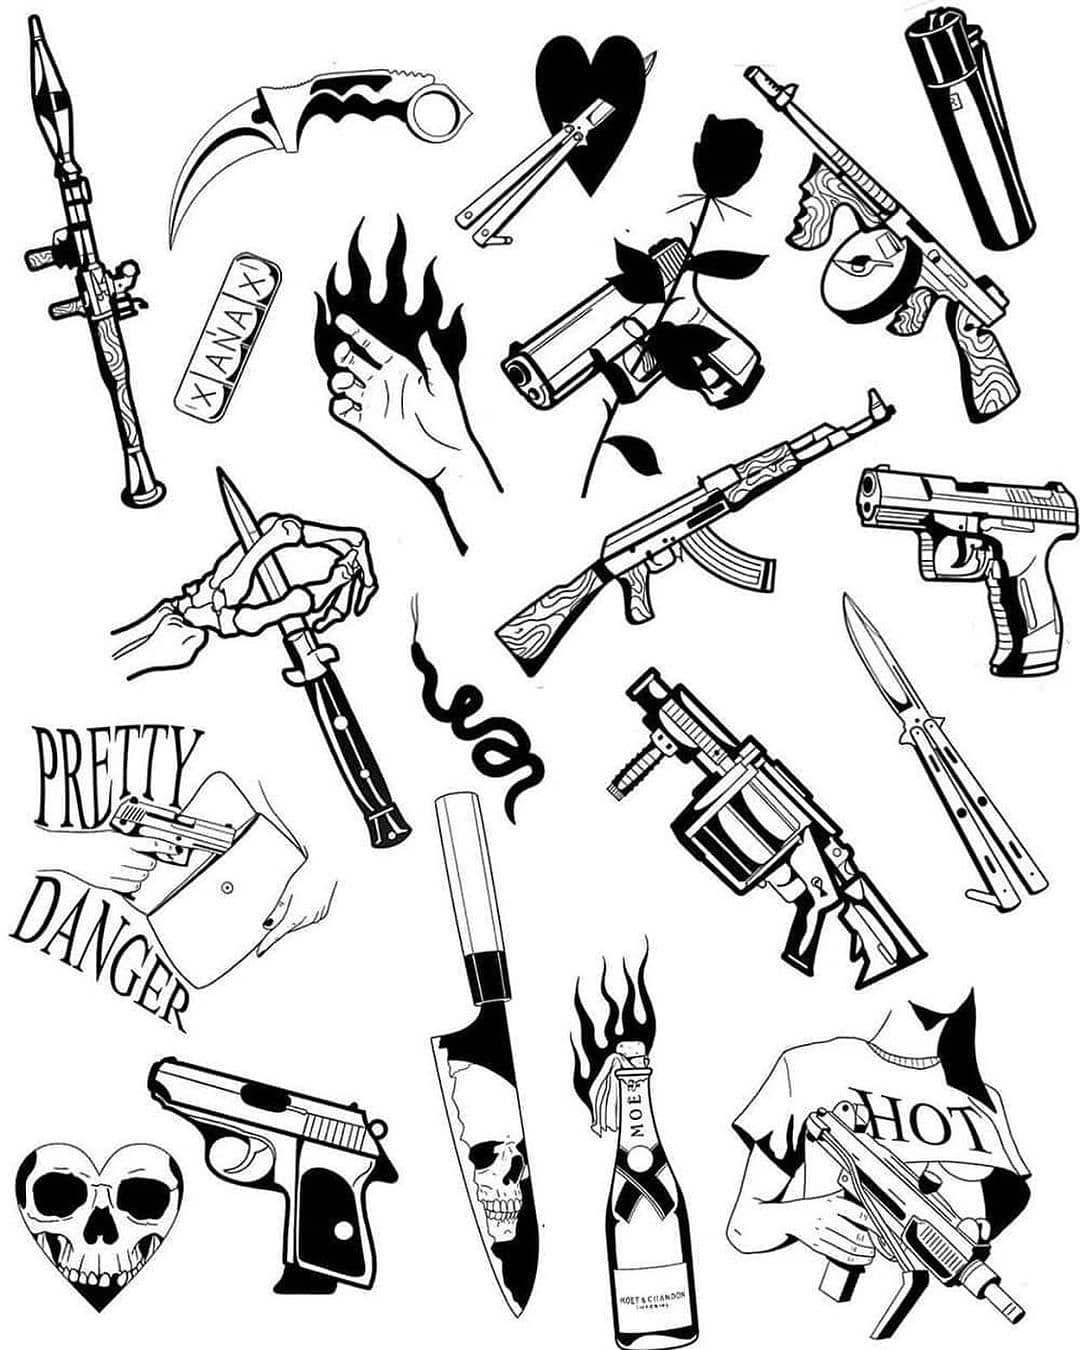 Bocetos De Tatuajes Tradicionales pin de juänpä granati en planchas tattoo | bocetos tatuajes